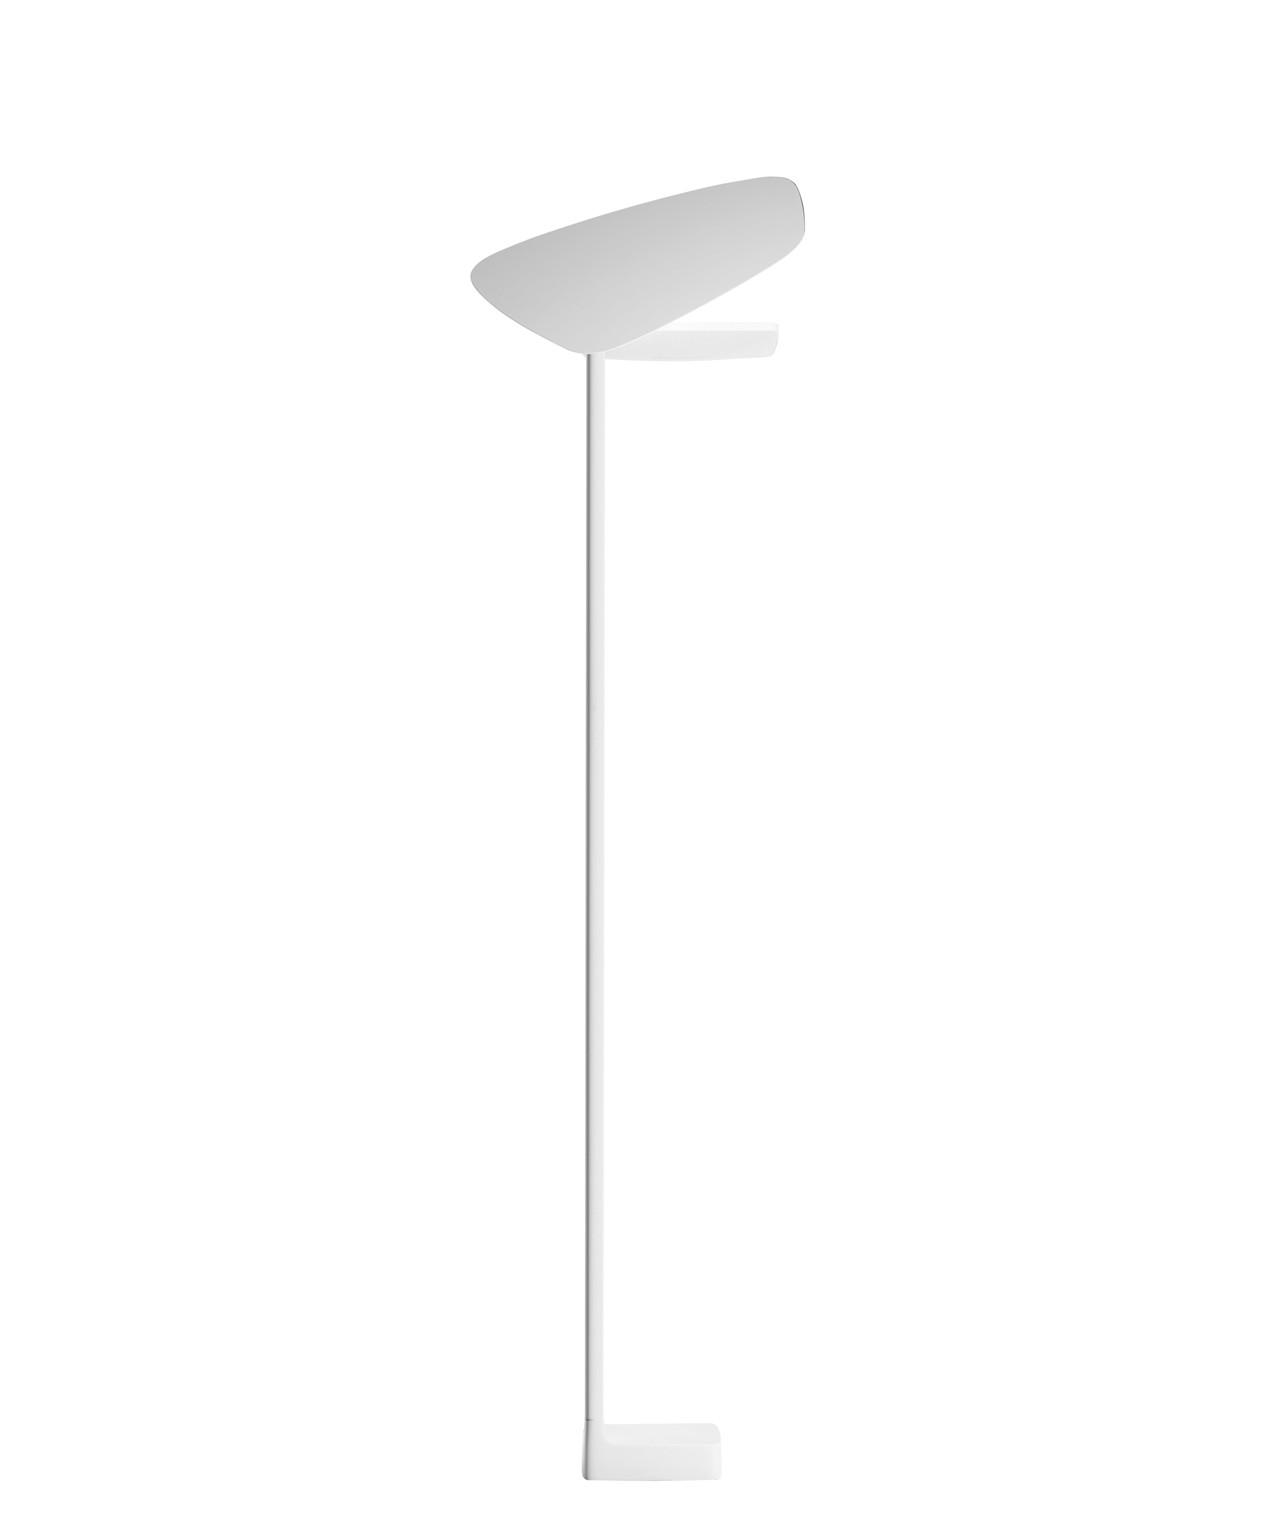 Lightwing Gulvlampe Hvid - Foscarini